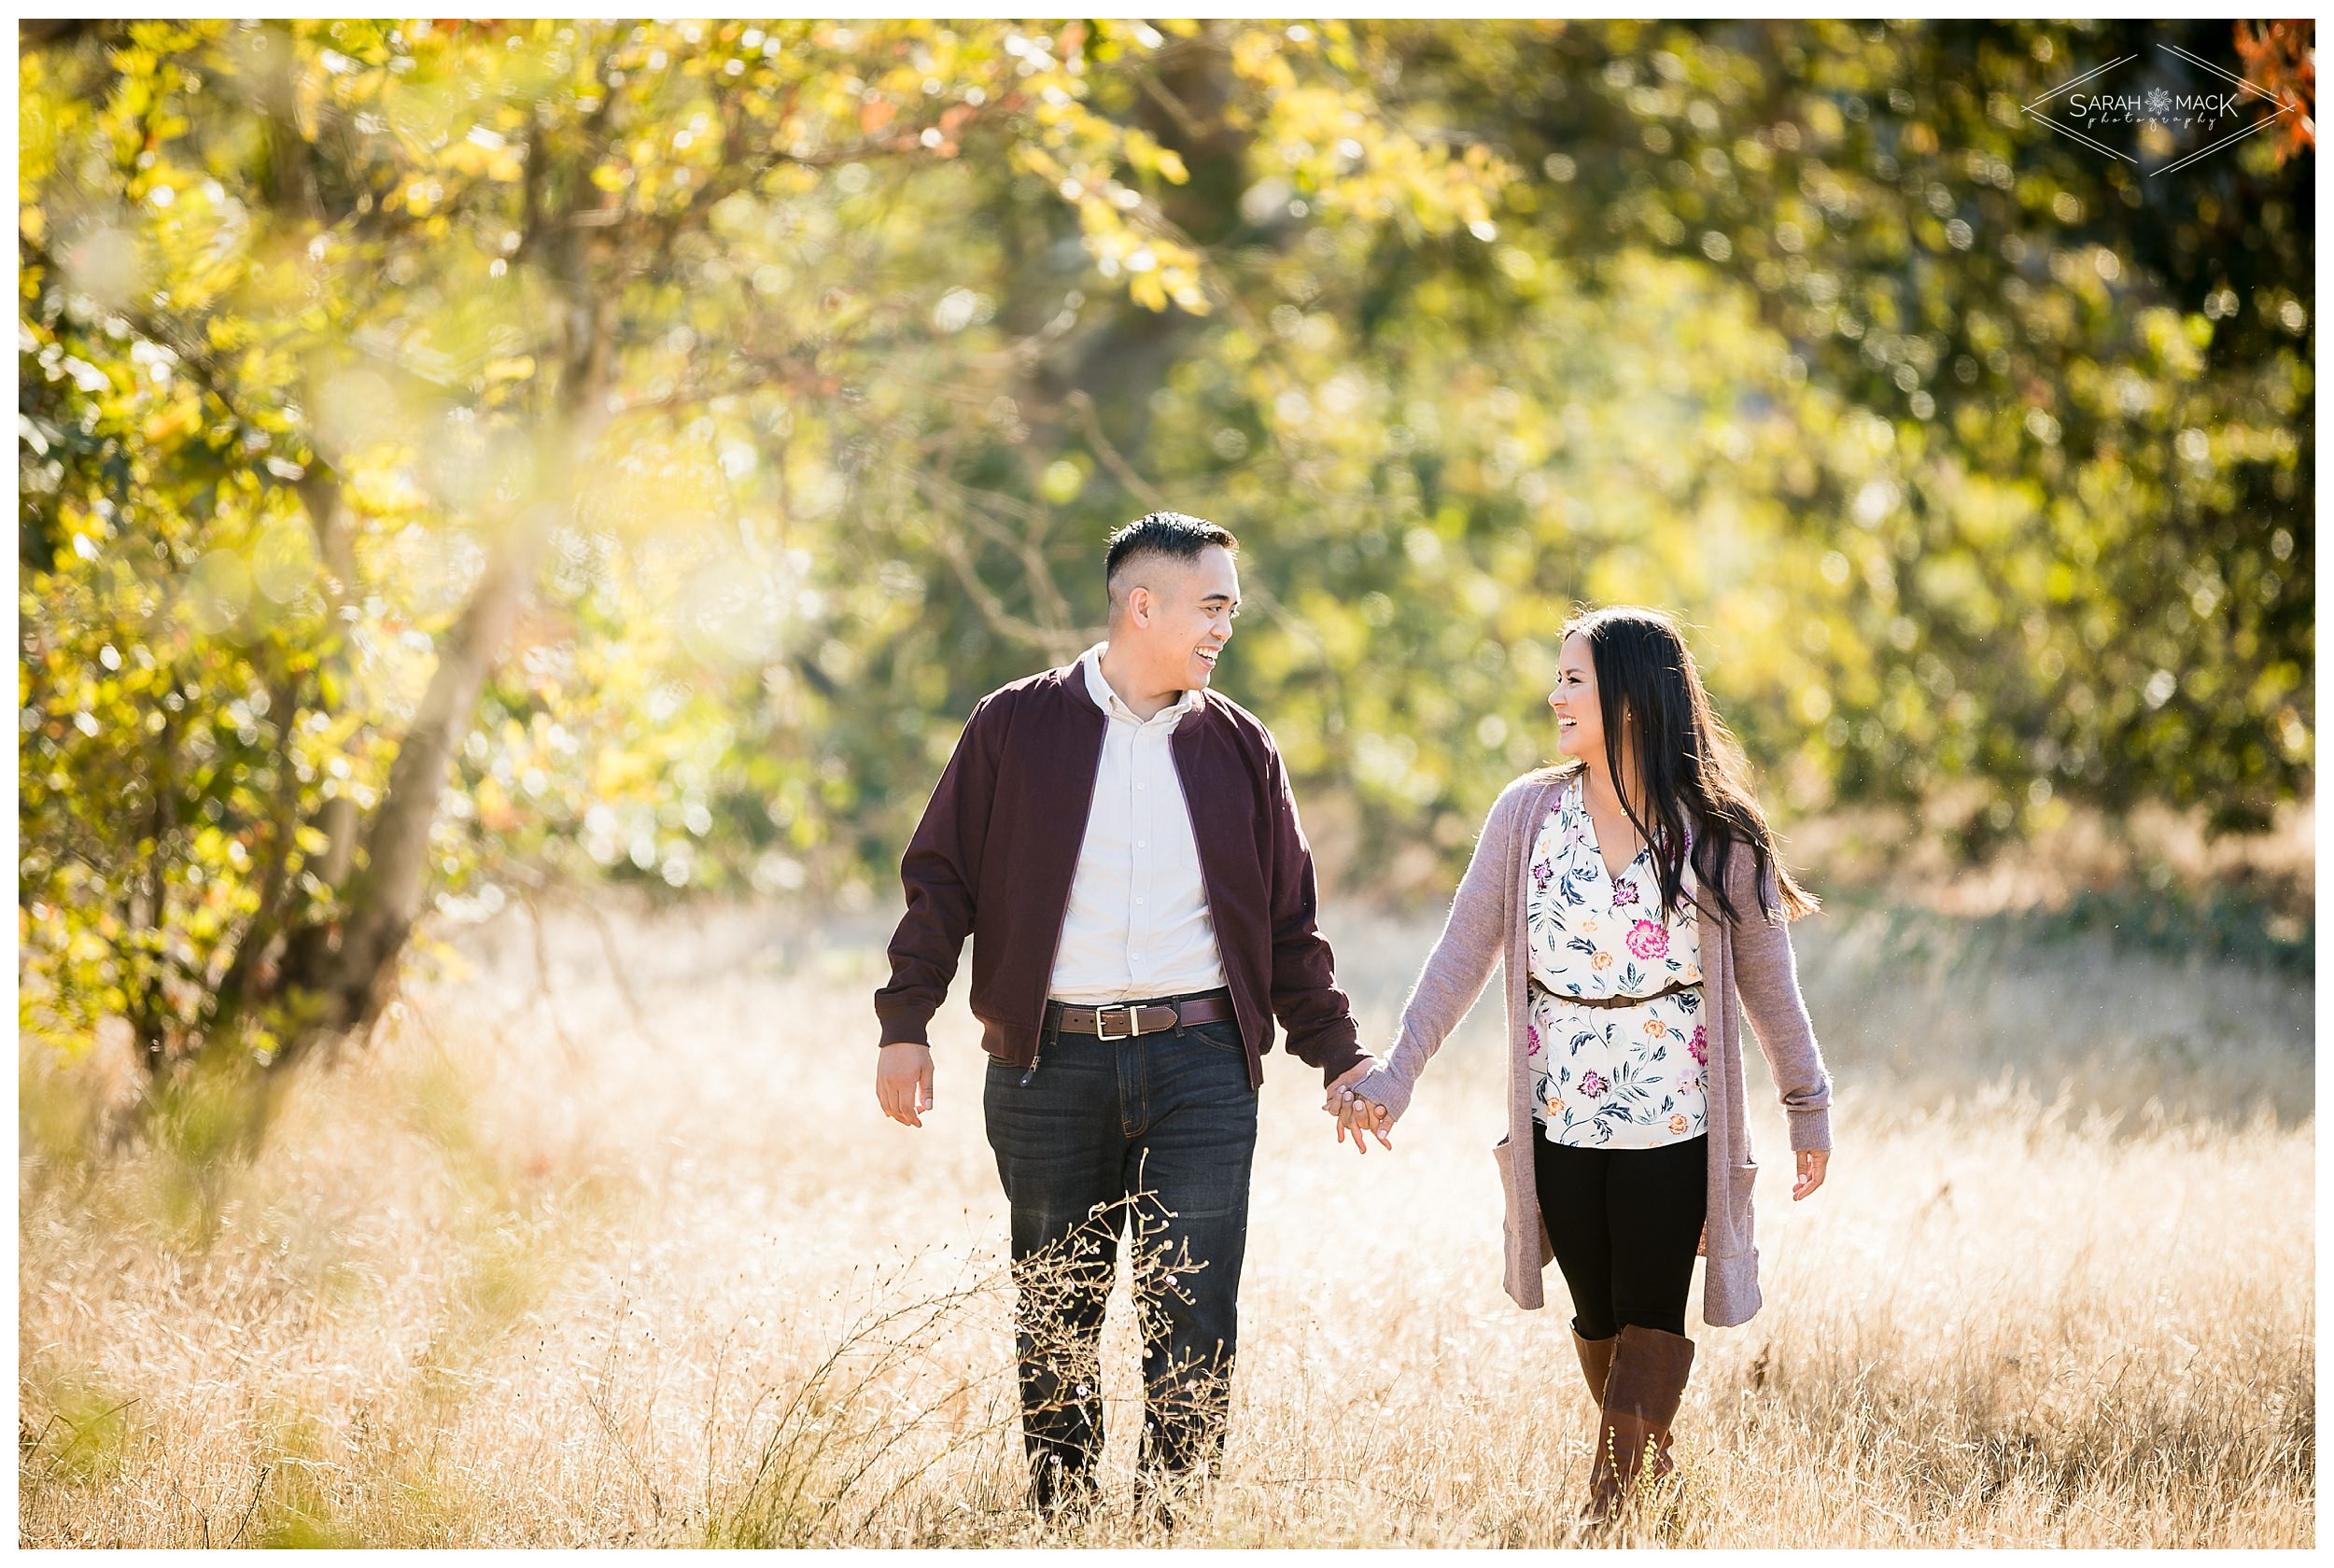 LE_Orange-County-Engagement-Photography 25.jpg